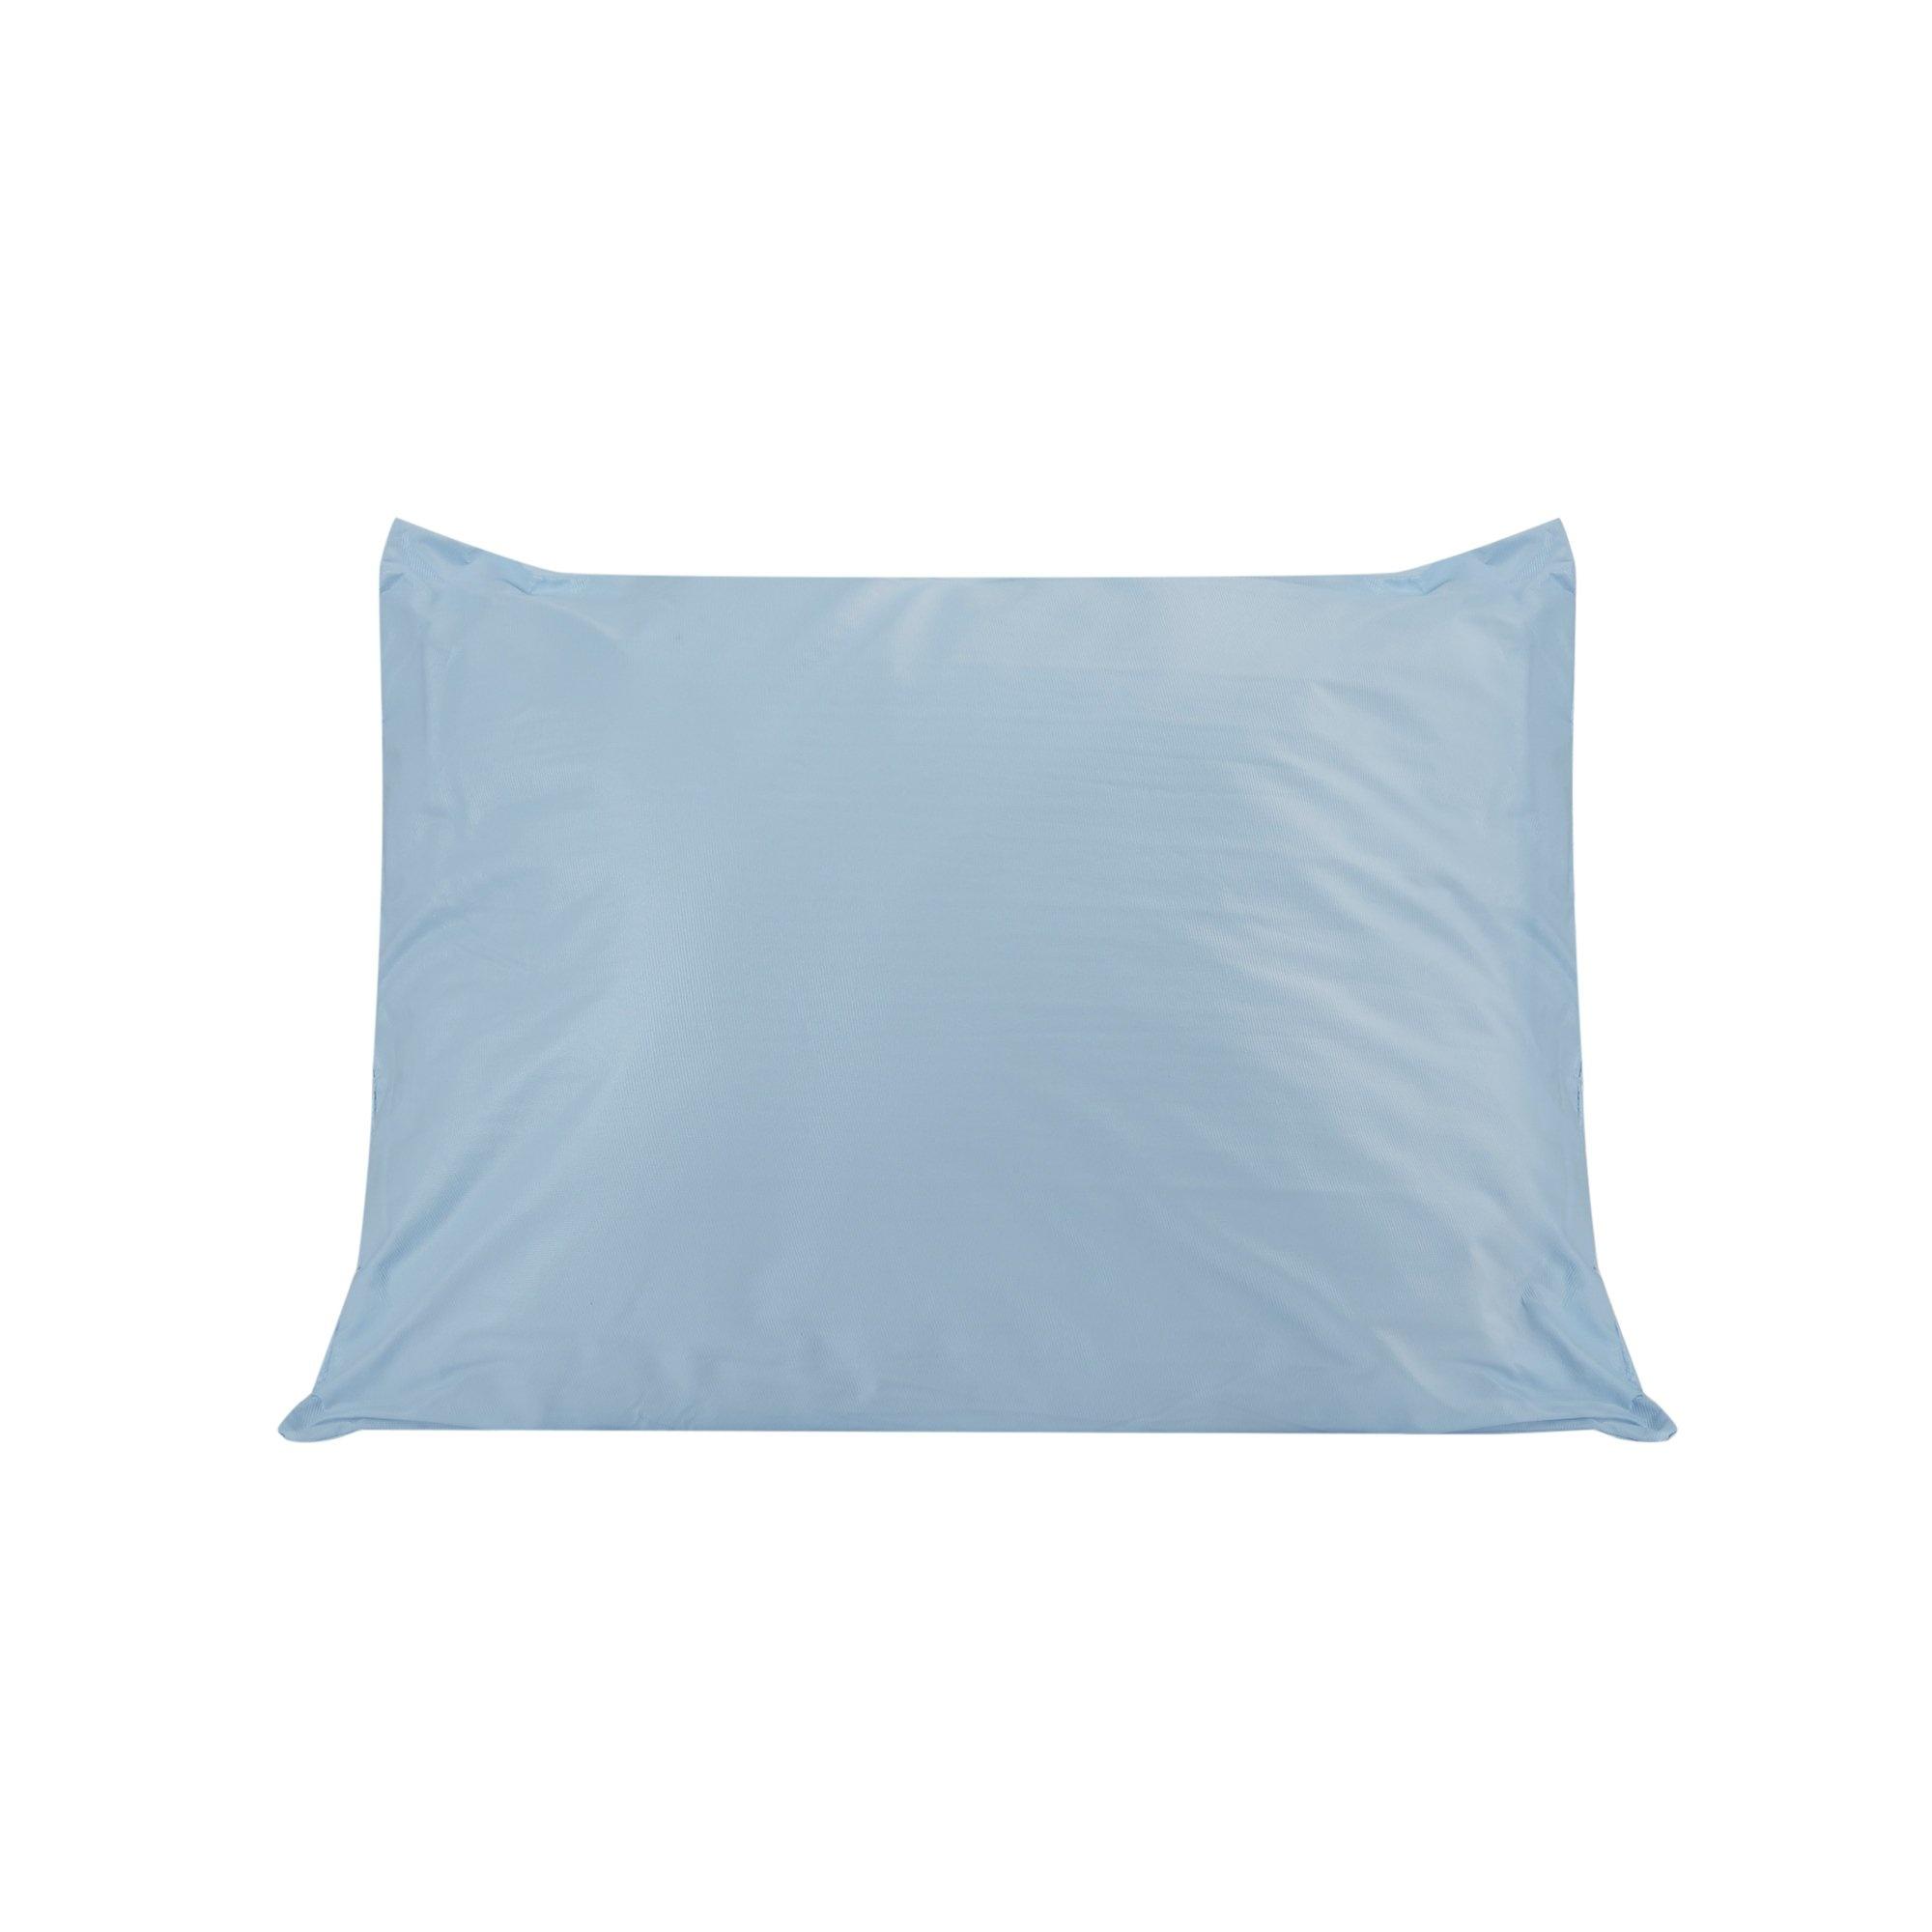 "McKesson Bed Pillow, 41-2026-BXF, Blue (20 X 26"") - 1 Each"